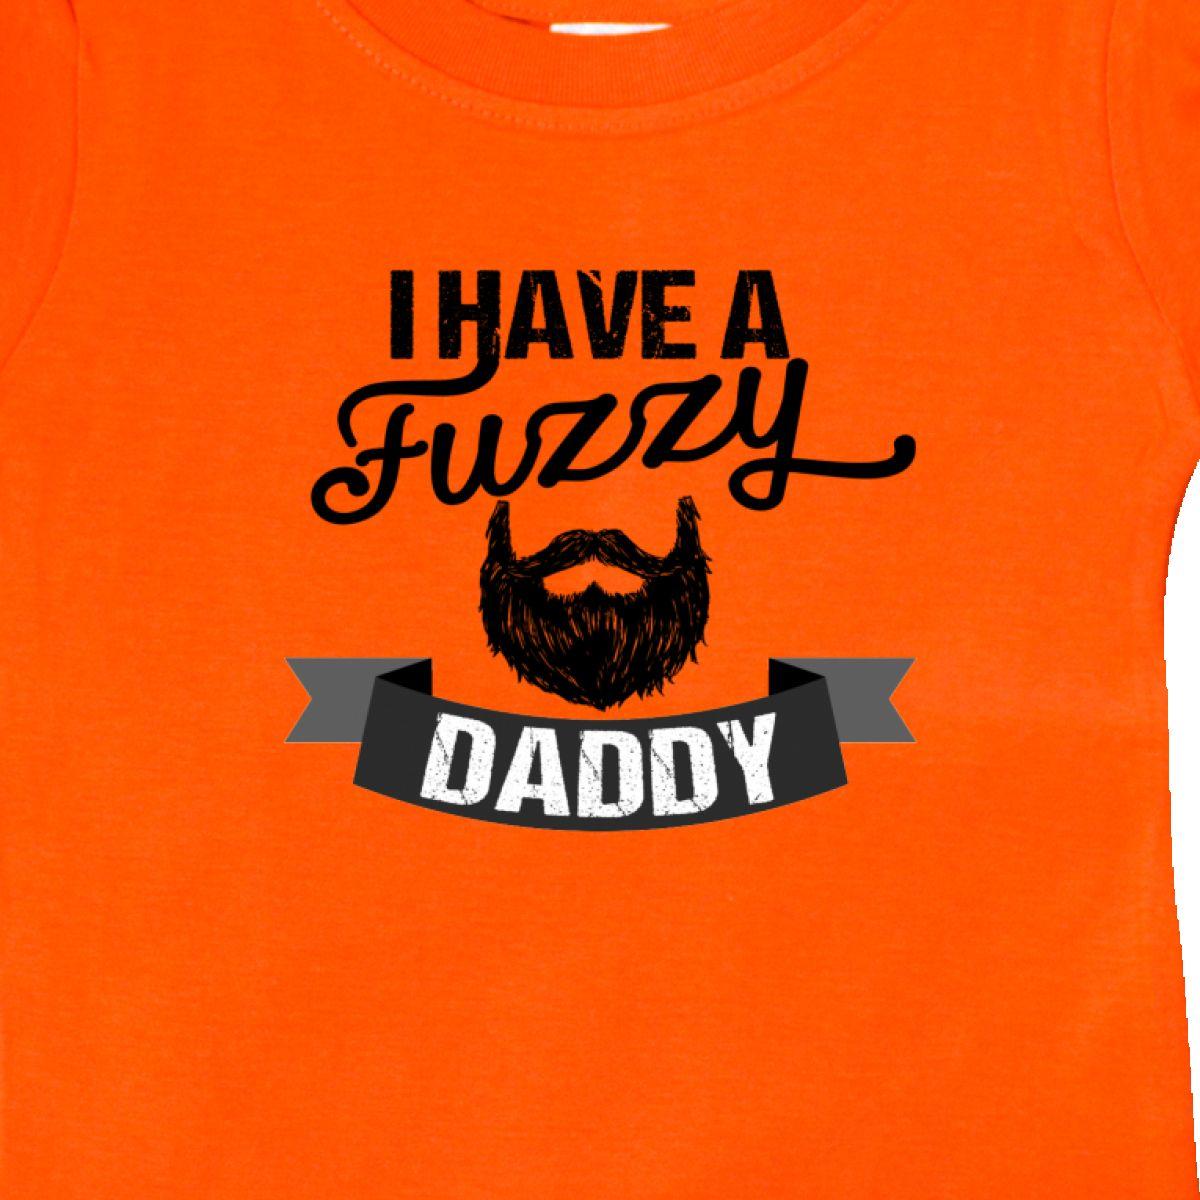 cc96f4f59 Inktastic I Have A Fuzzy Daddy Beard Baby T-Shirt Men Beards Tattoos ...